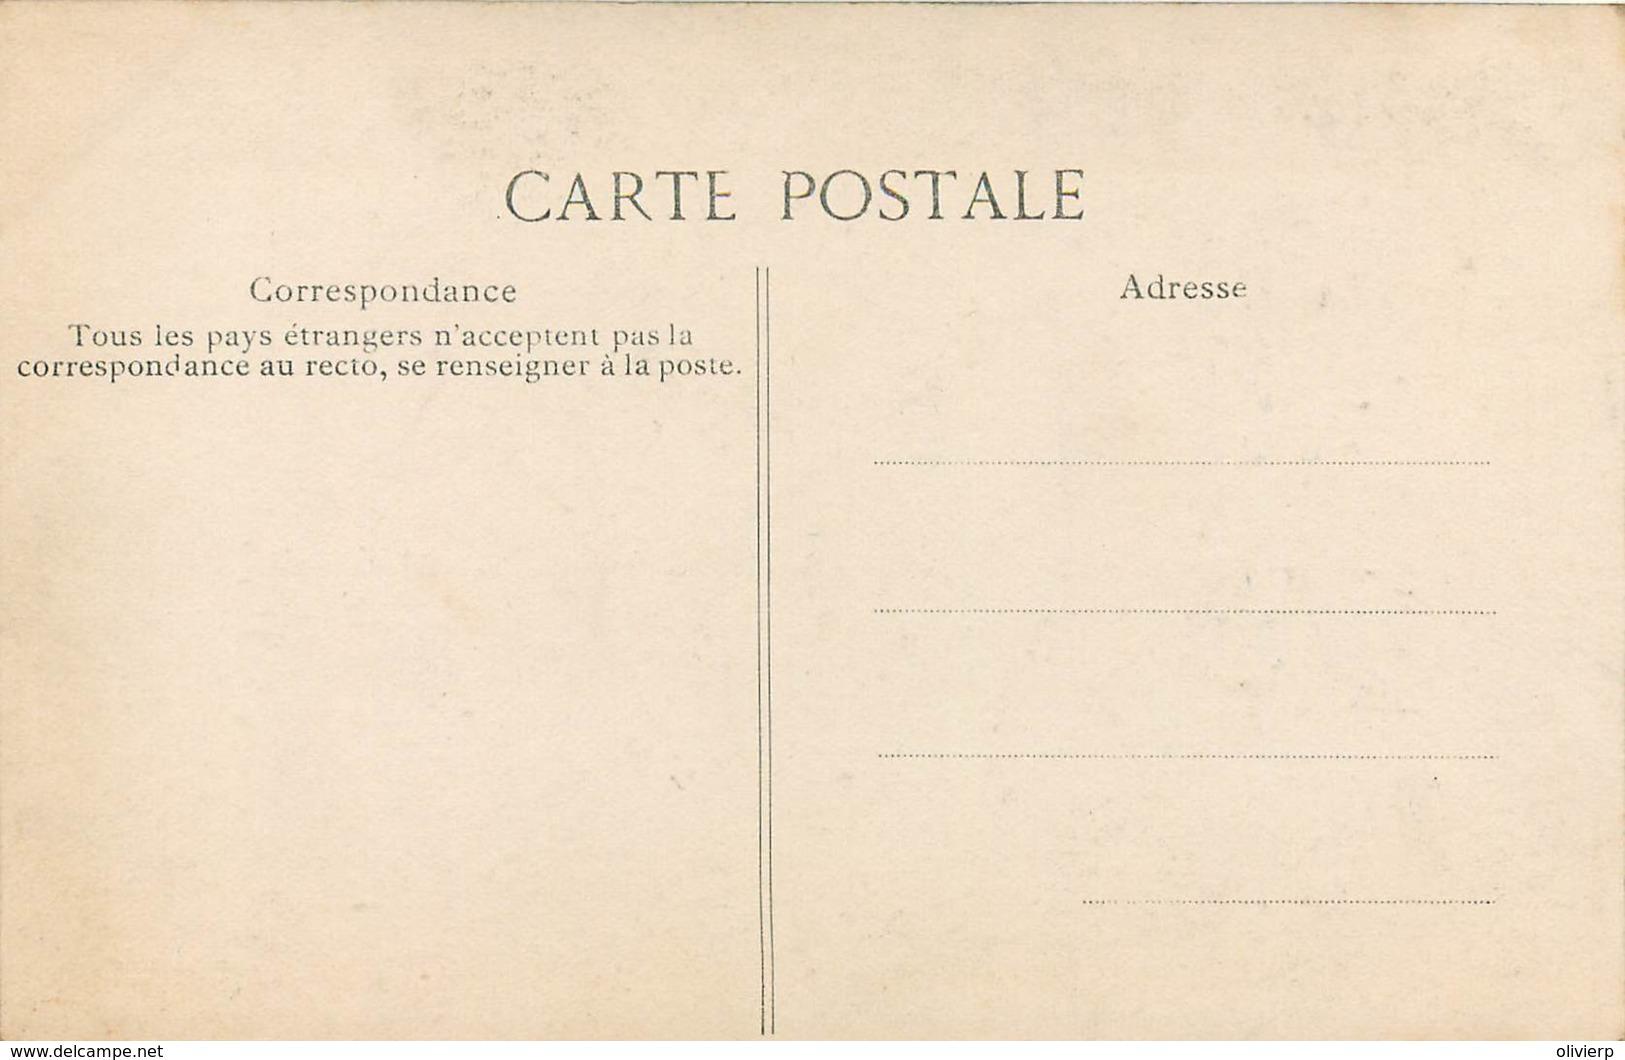 France - Sports - Aviation - Wilburg Wright Le Célèbre Aviateur - Cartoline